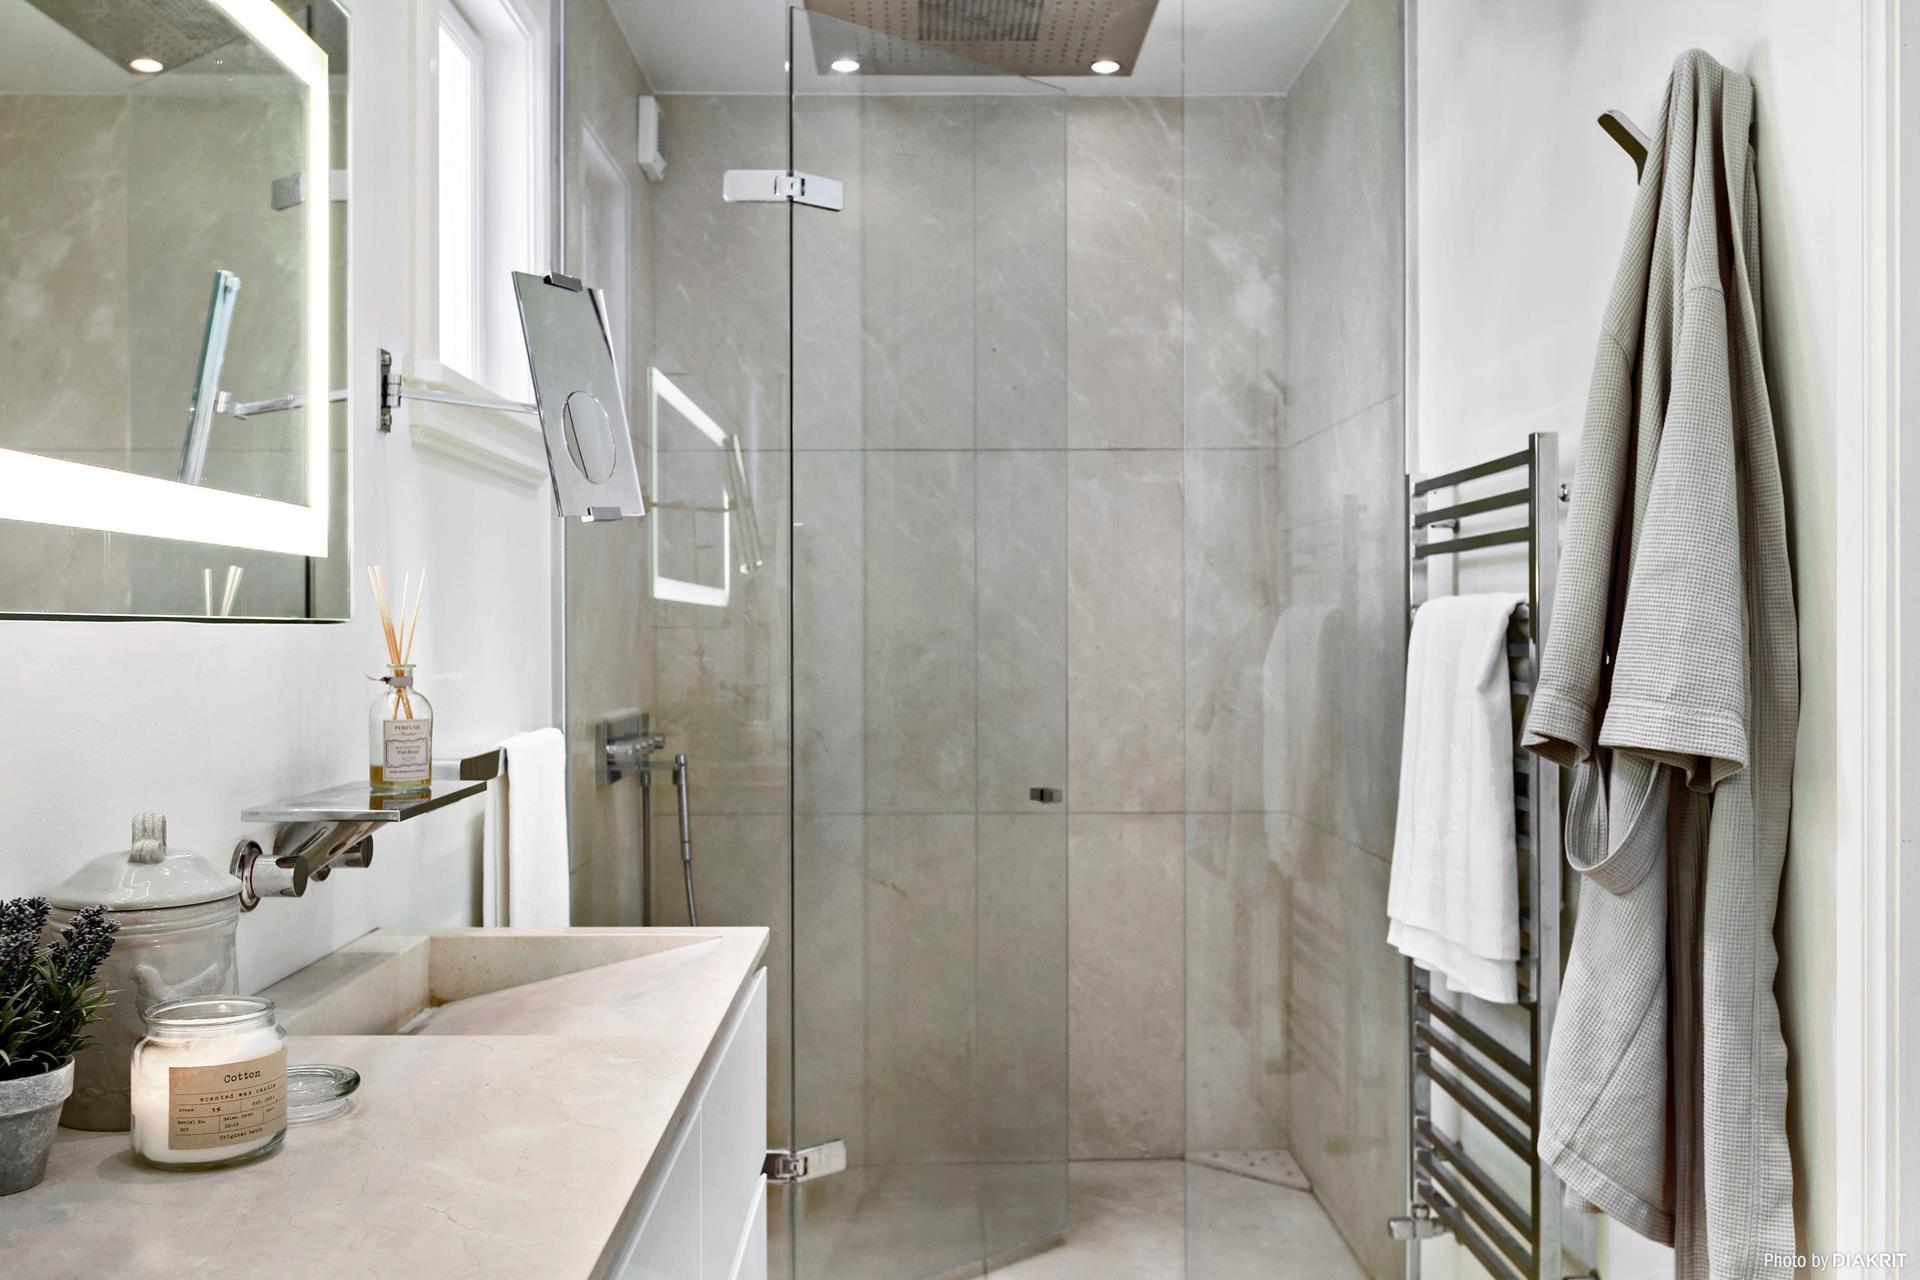 санузел раковина душ полотенцесушитель